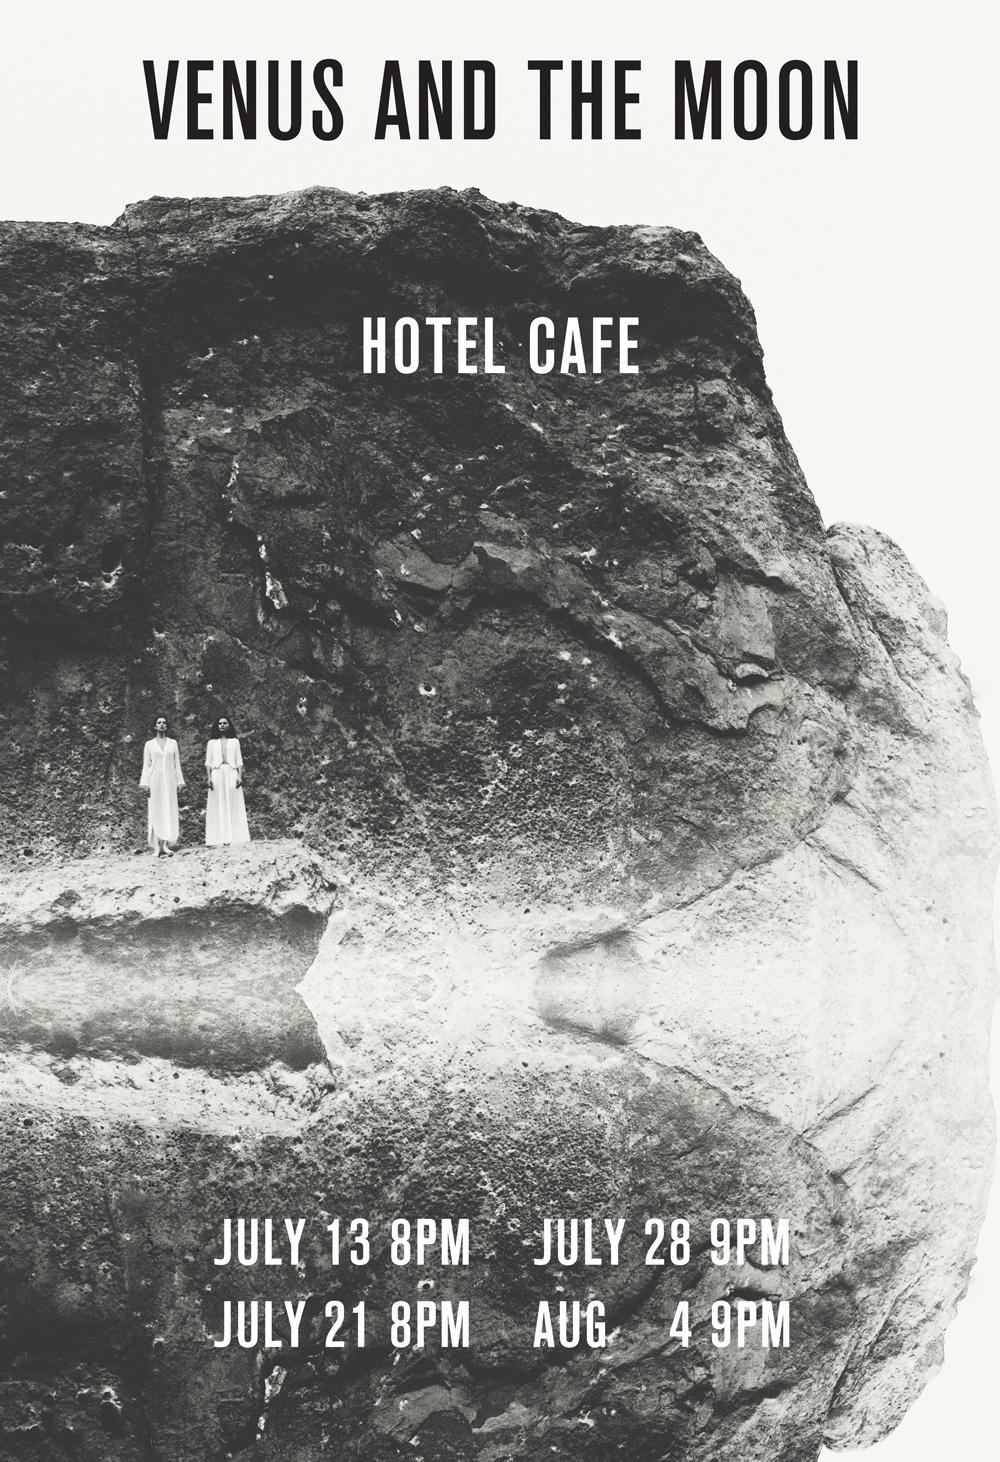 venus-and-the-moon_hotel_cafe_weekly.jpg